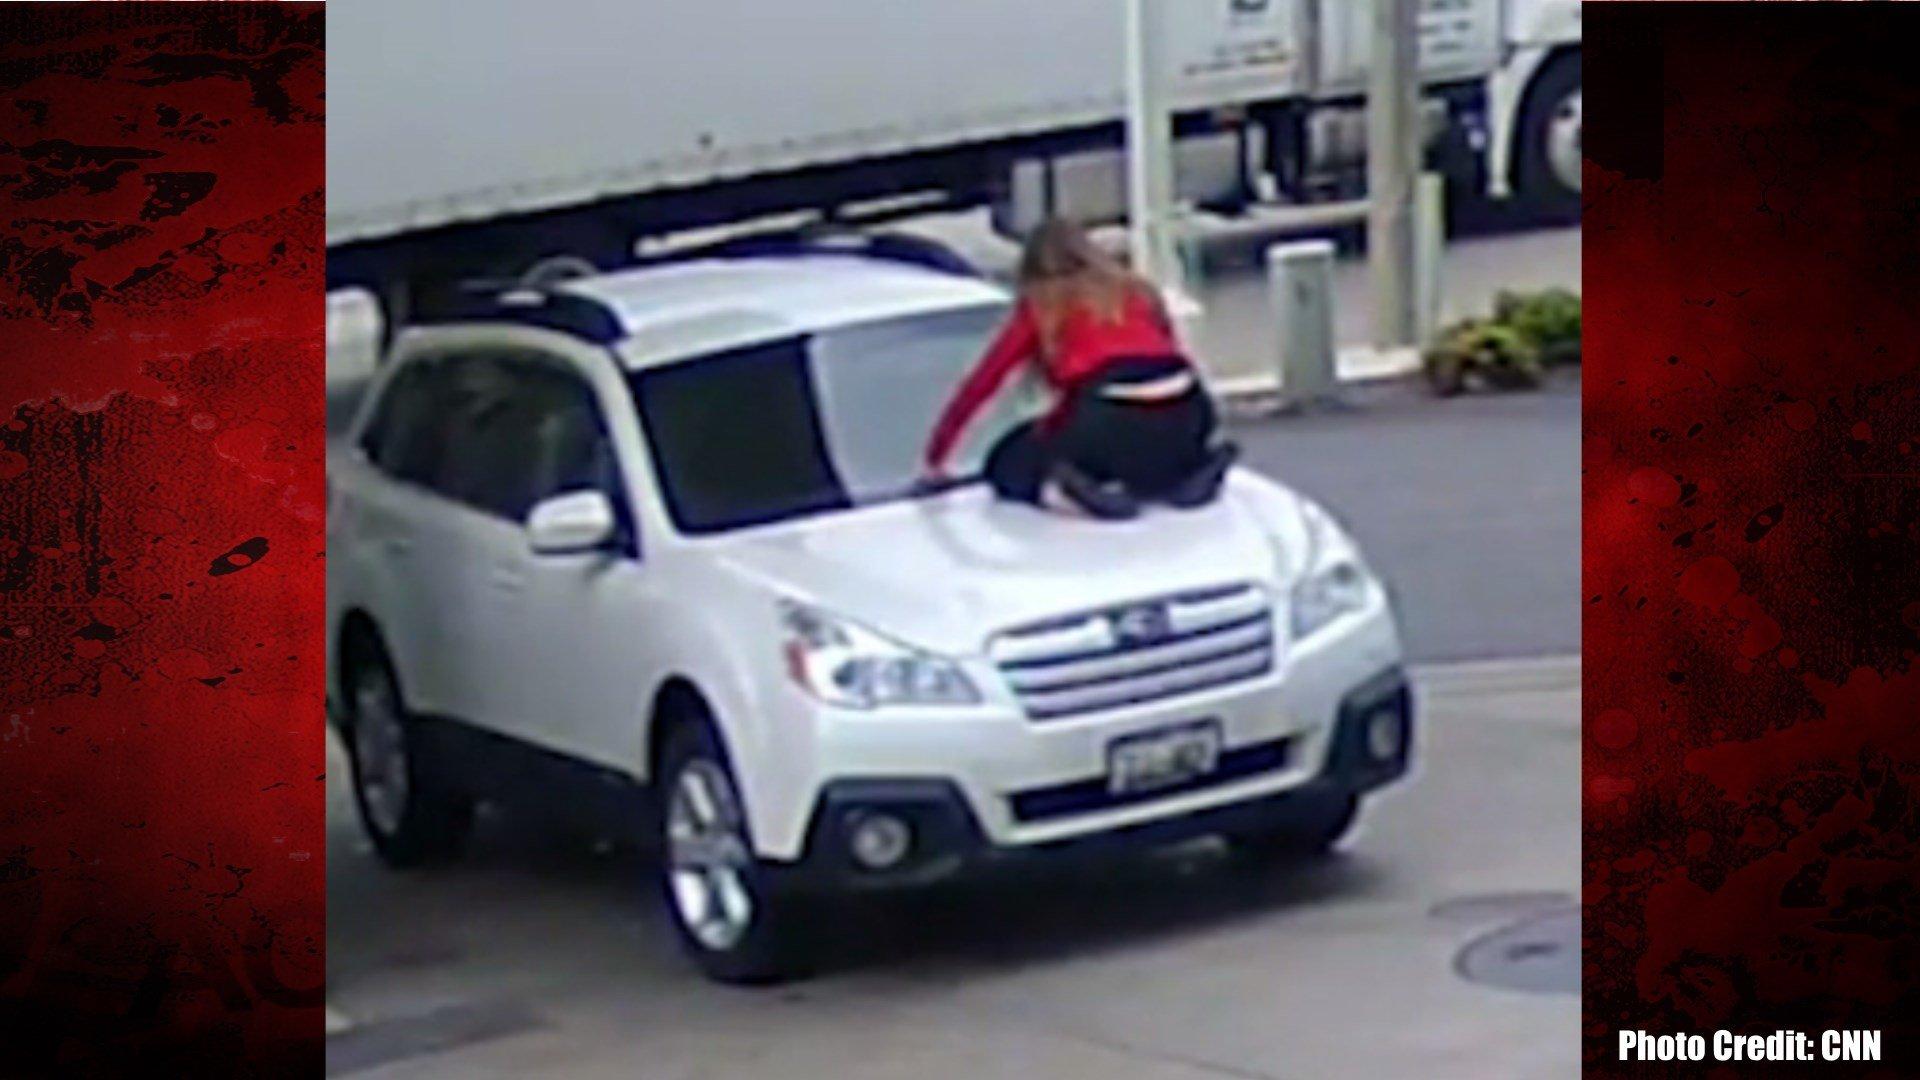 Woman Fights Off Car Thief at Gas Pump